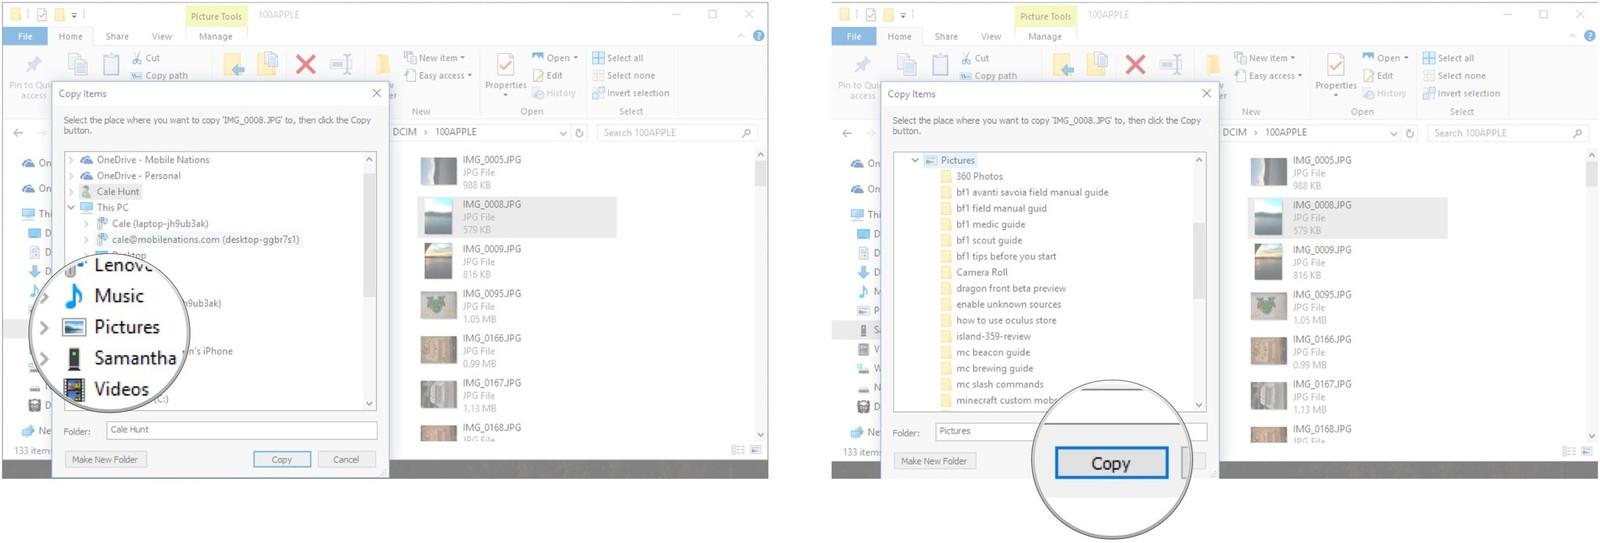 kak-perenesti-fotografii-s-iphone-i-ipad-na-kompyuter-s-windows-10-fajjlovyjj-menedzher-5